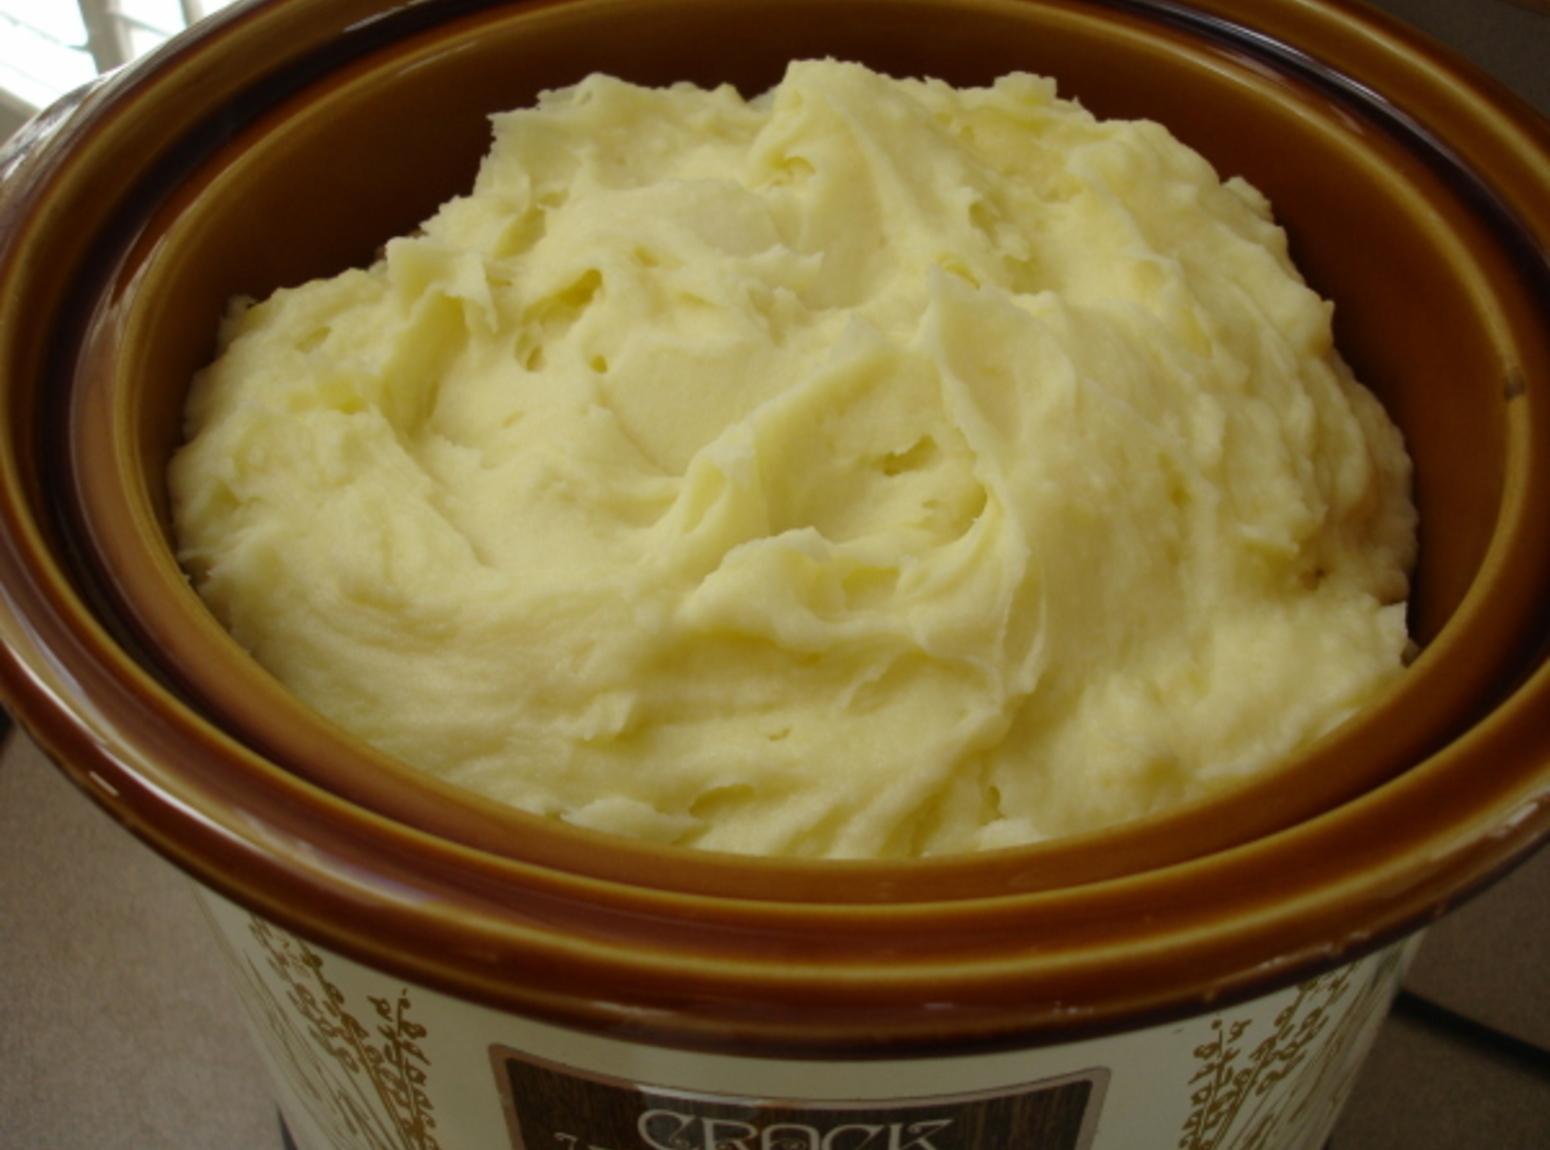 Mashed Potatoes In Crock Pot  Crock Pot Mashed Potatoes Recipe